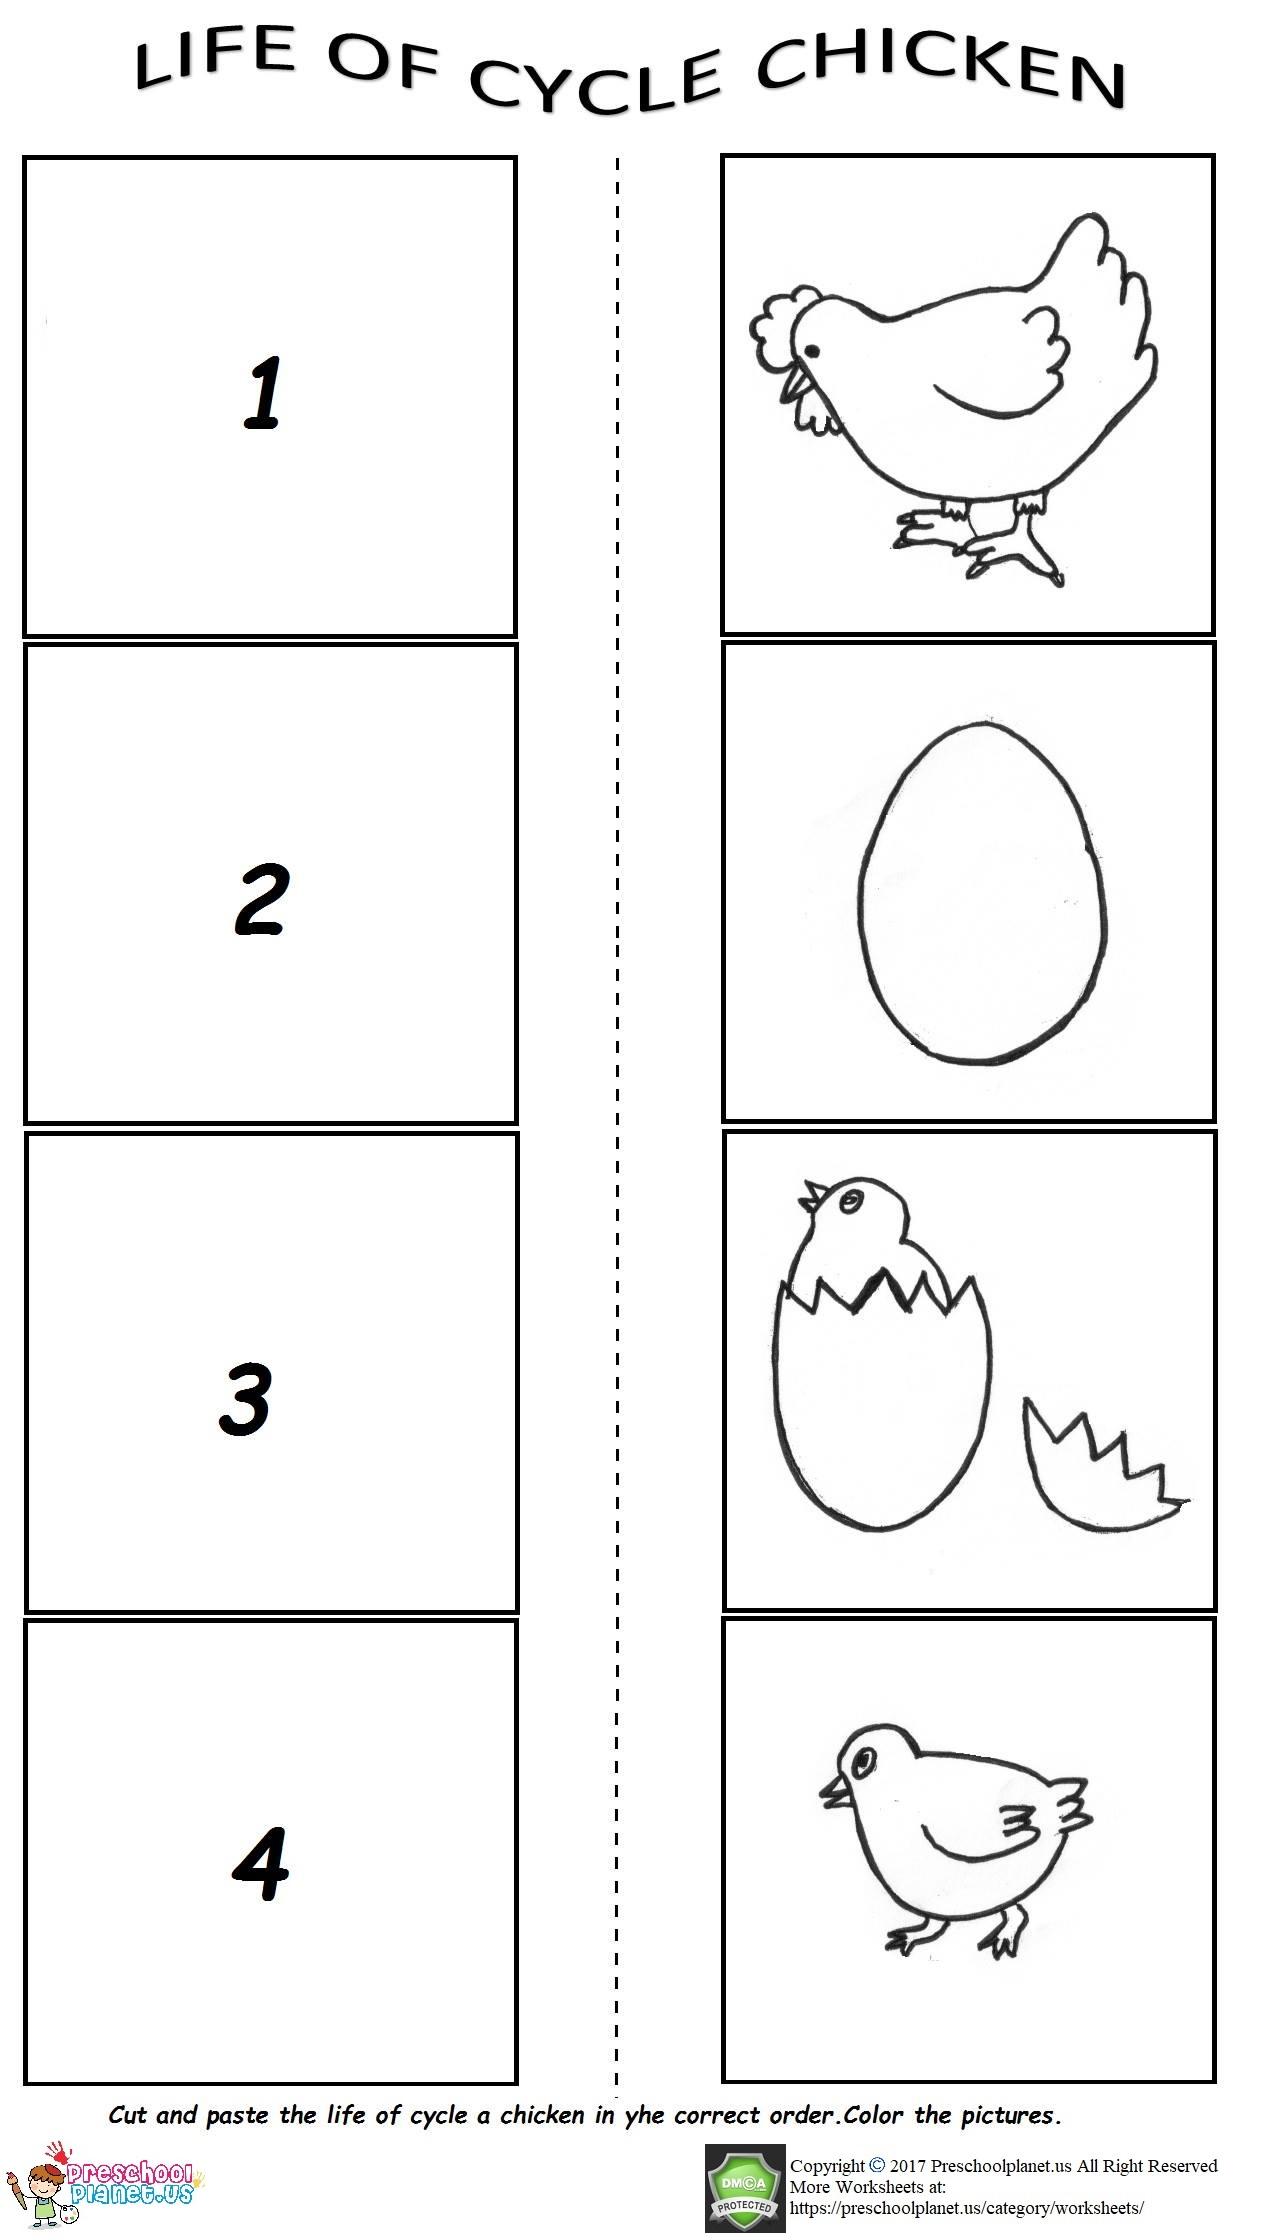 Visual Perception Worksheet For Kids Preschoolplanet